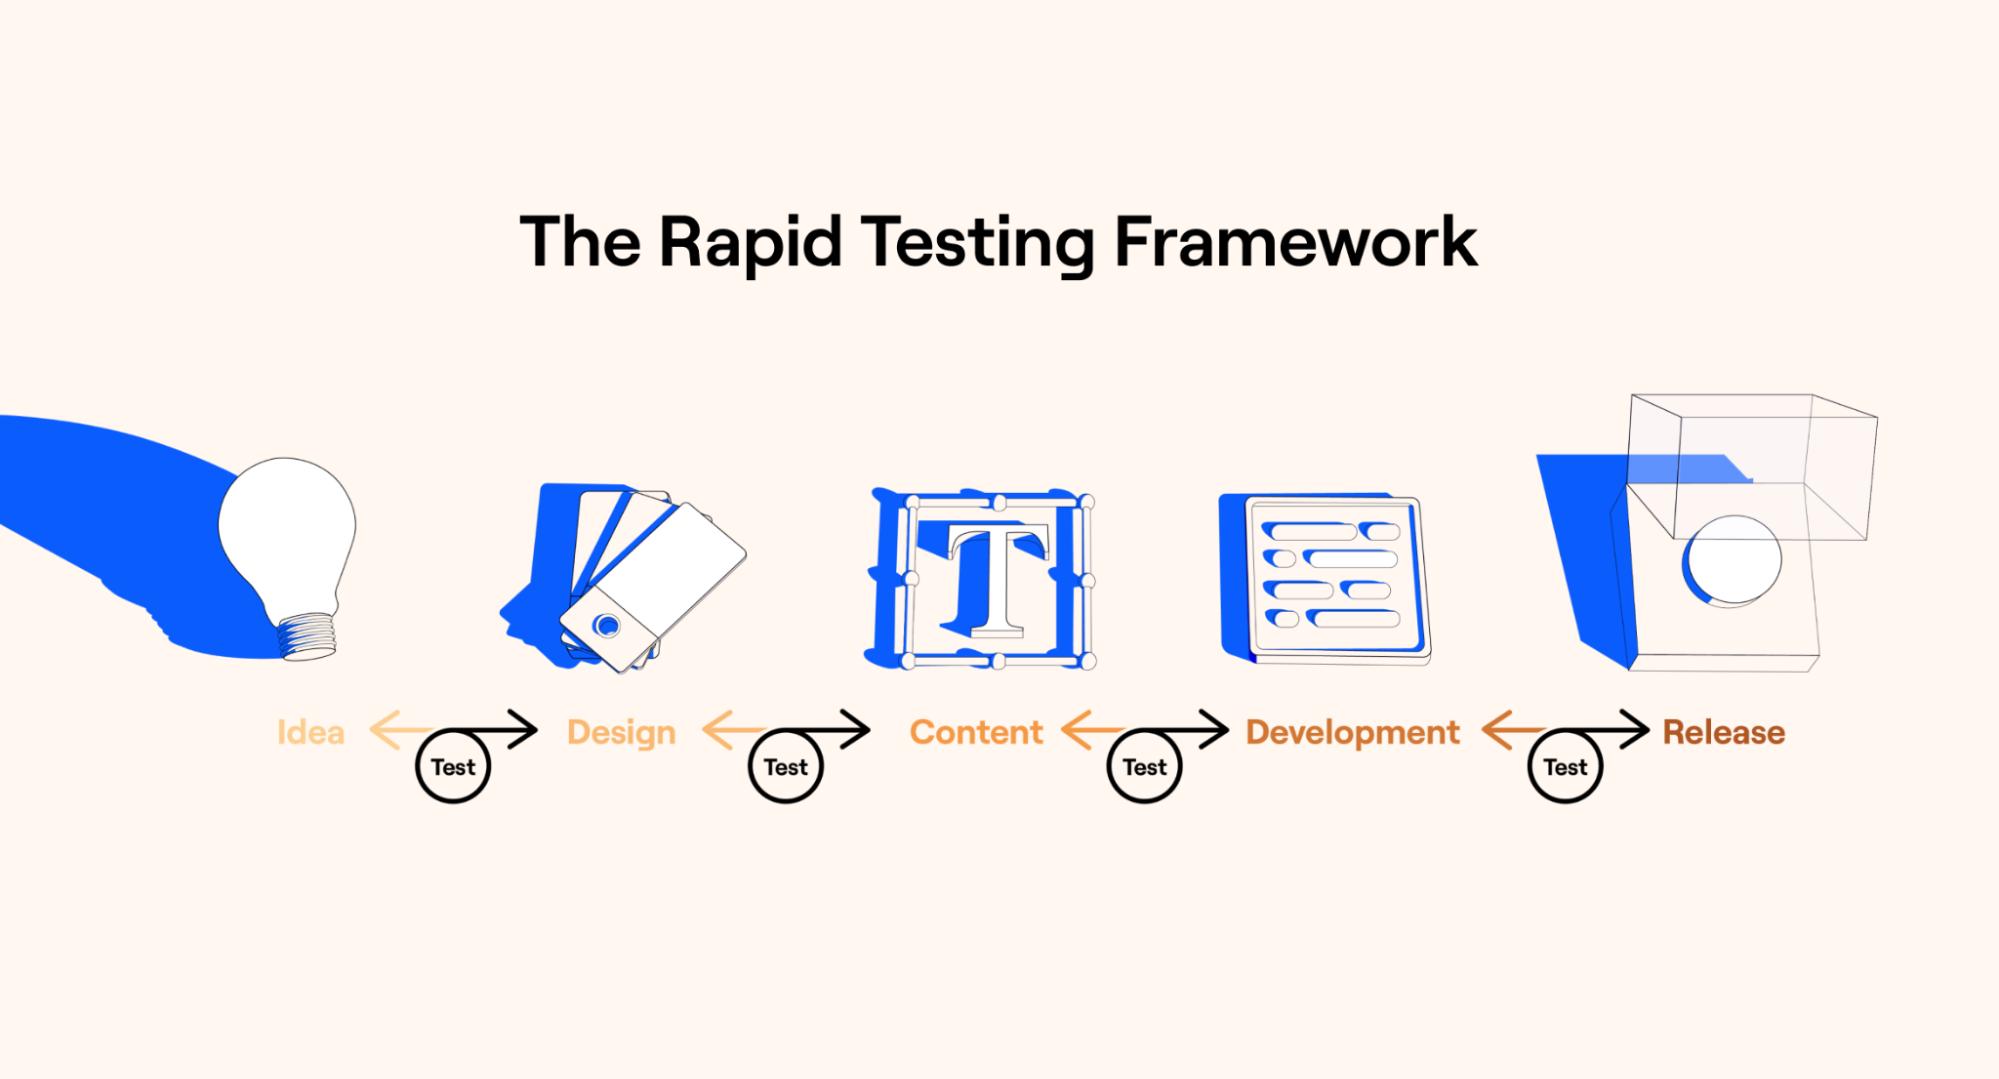 the rapid testing framework